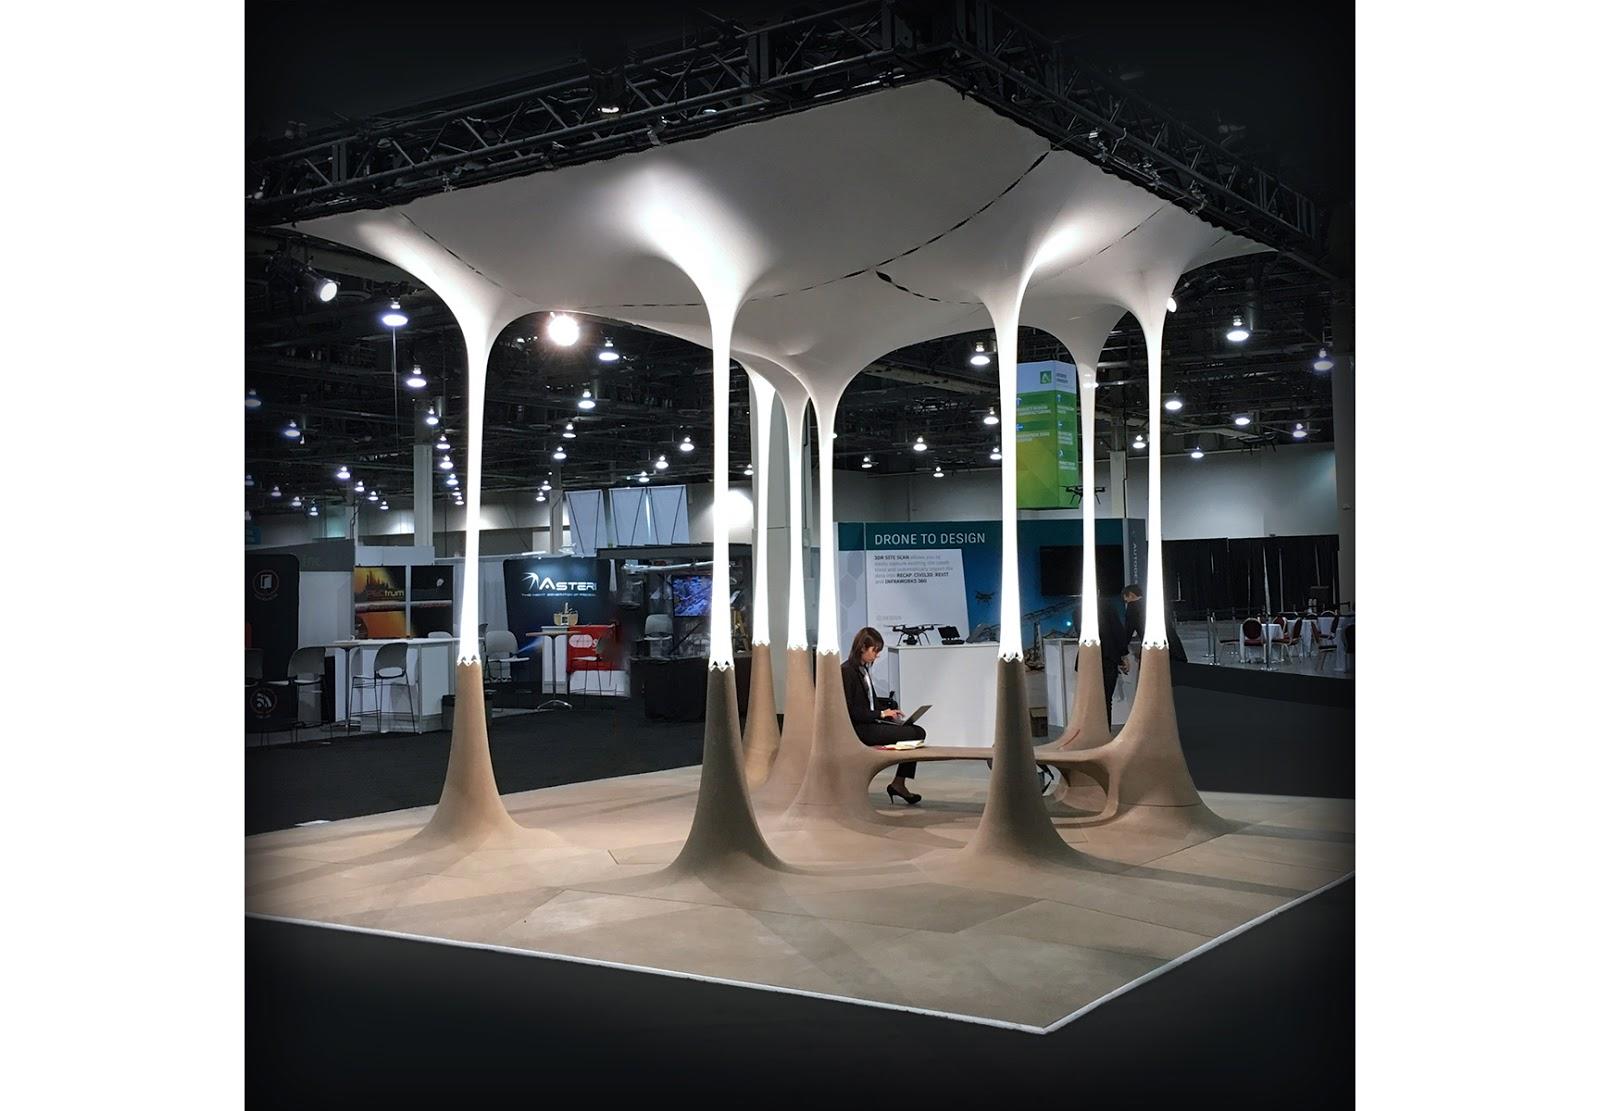 autodesk university 2016 generative design pavilion | dynamo bim